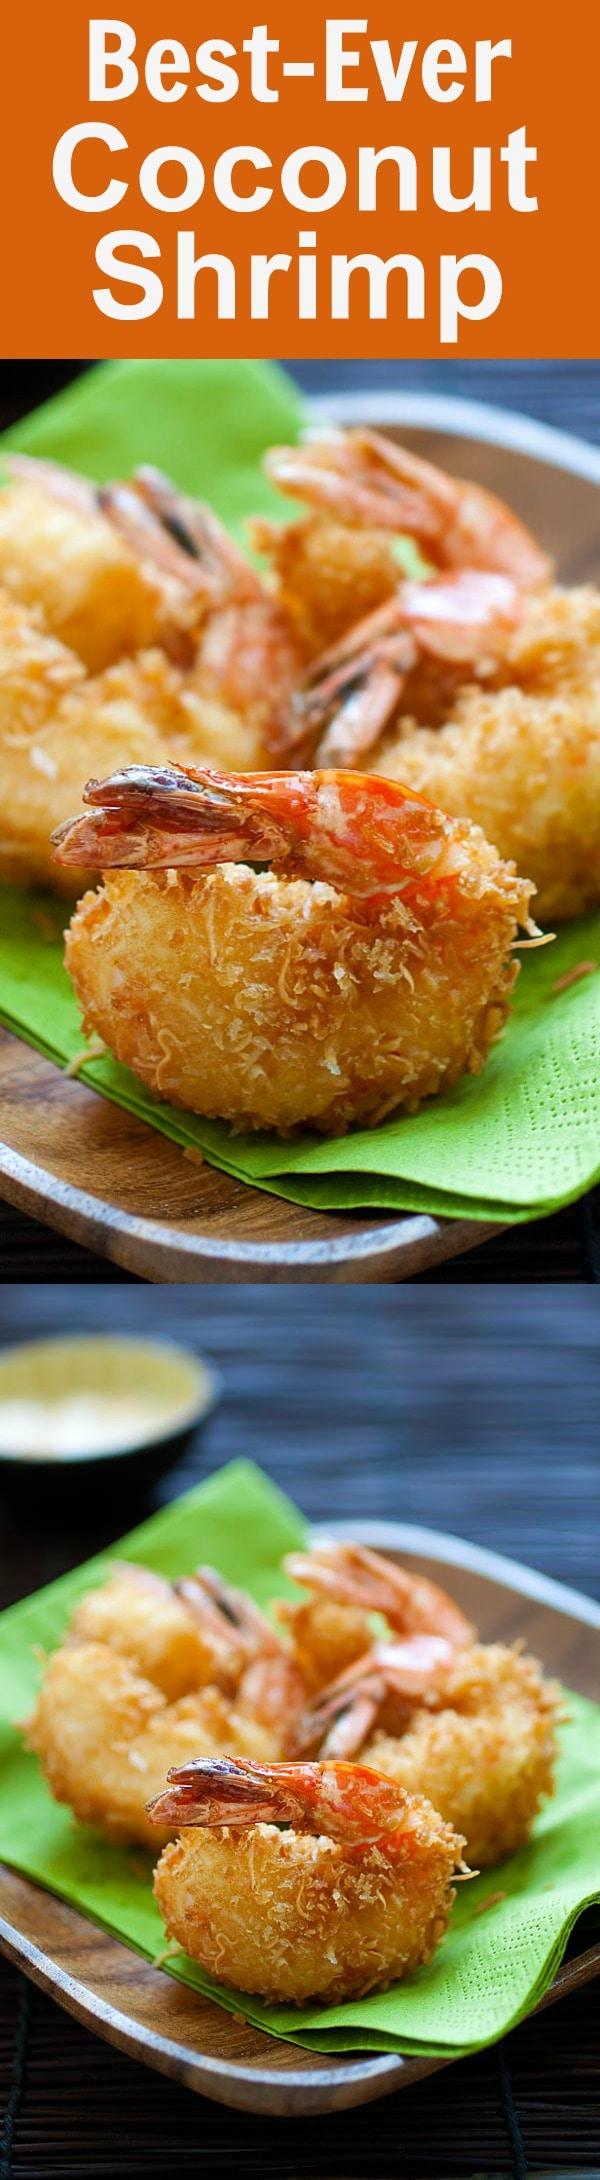 Coconut shrimp - the best and crispiest coconut shrimp recipe ever! Takes 20 mins, an easy and budget-friendly shrimp appetizer | rasamalaysia.com